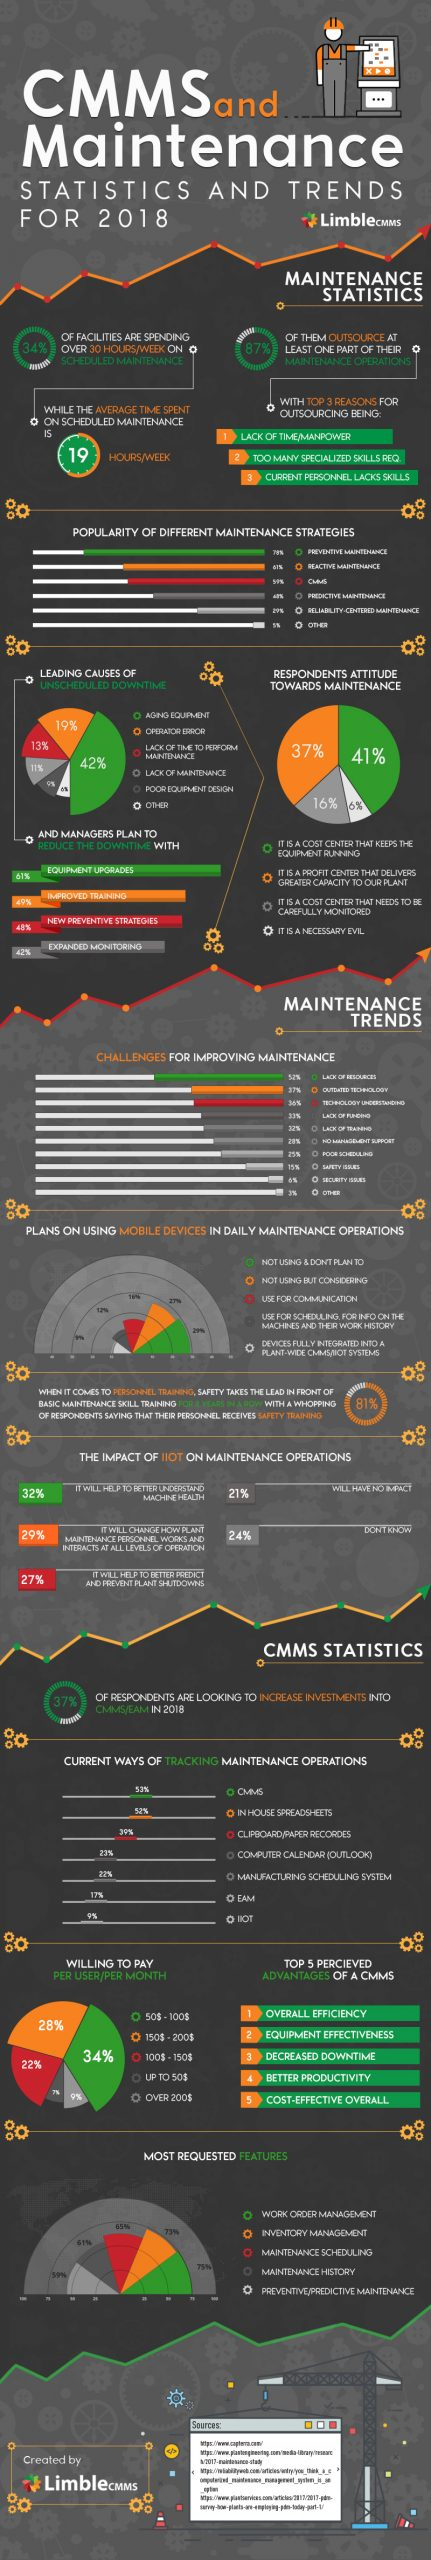 CMMS and Maintenance Statistics 2018